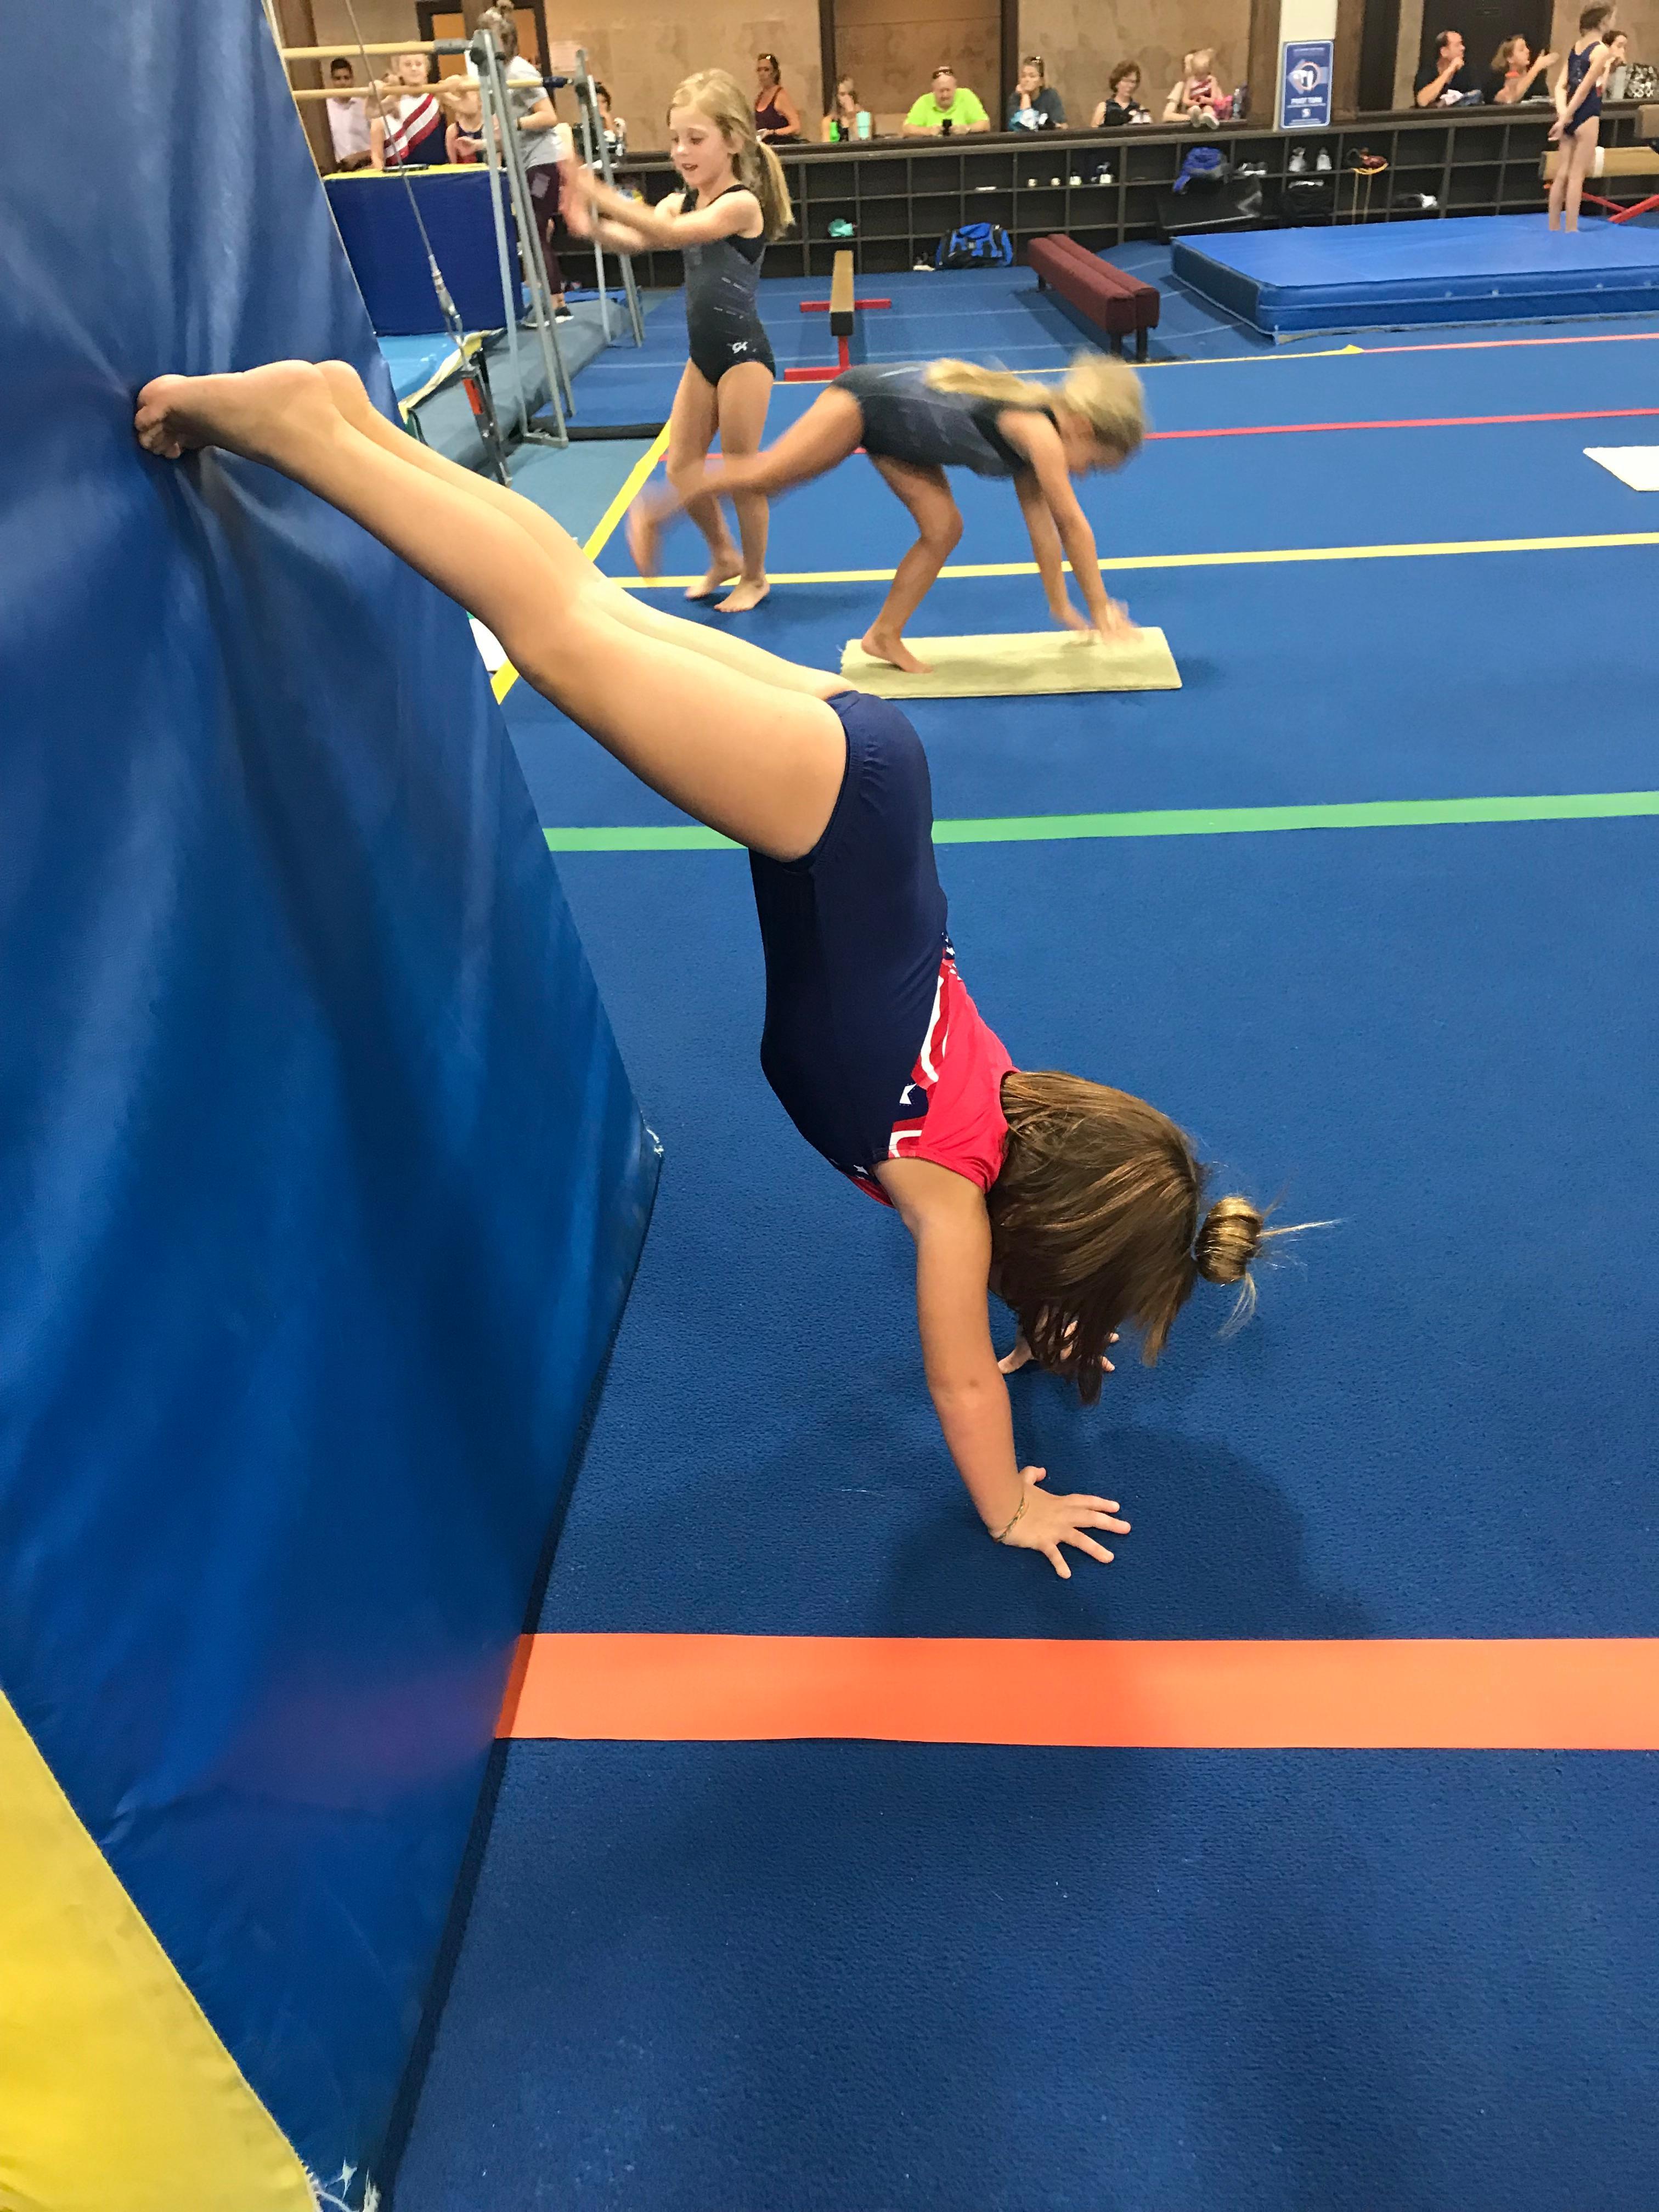 Texas East Gymnastics image 6